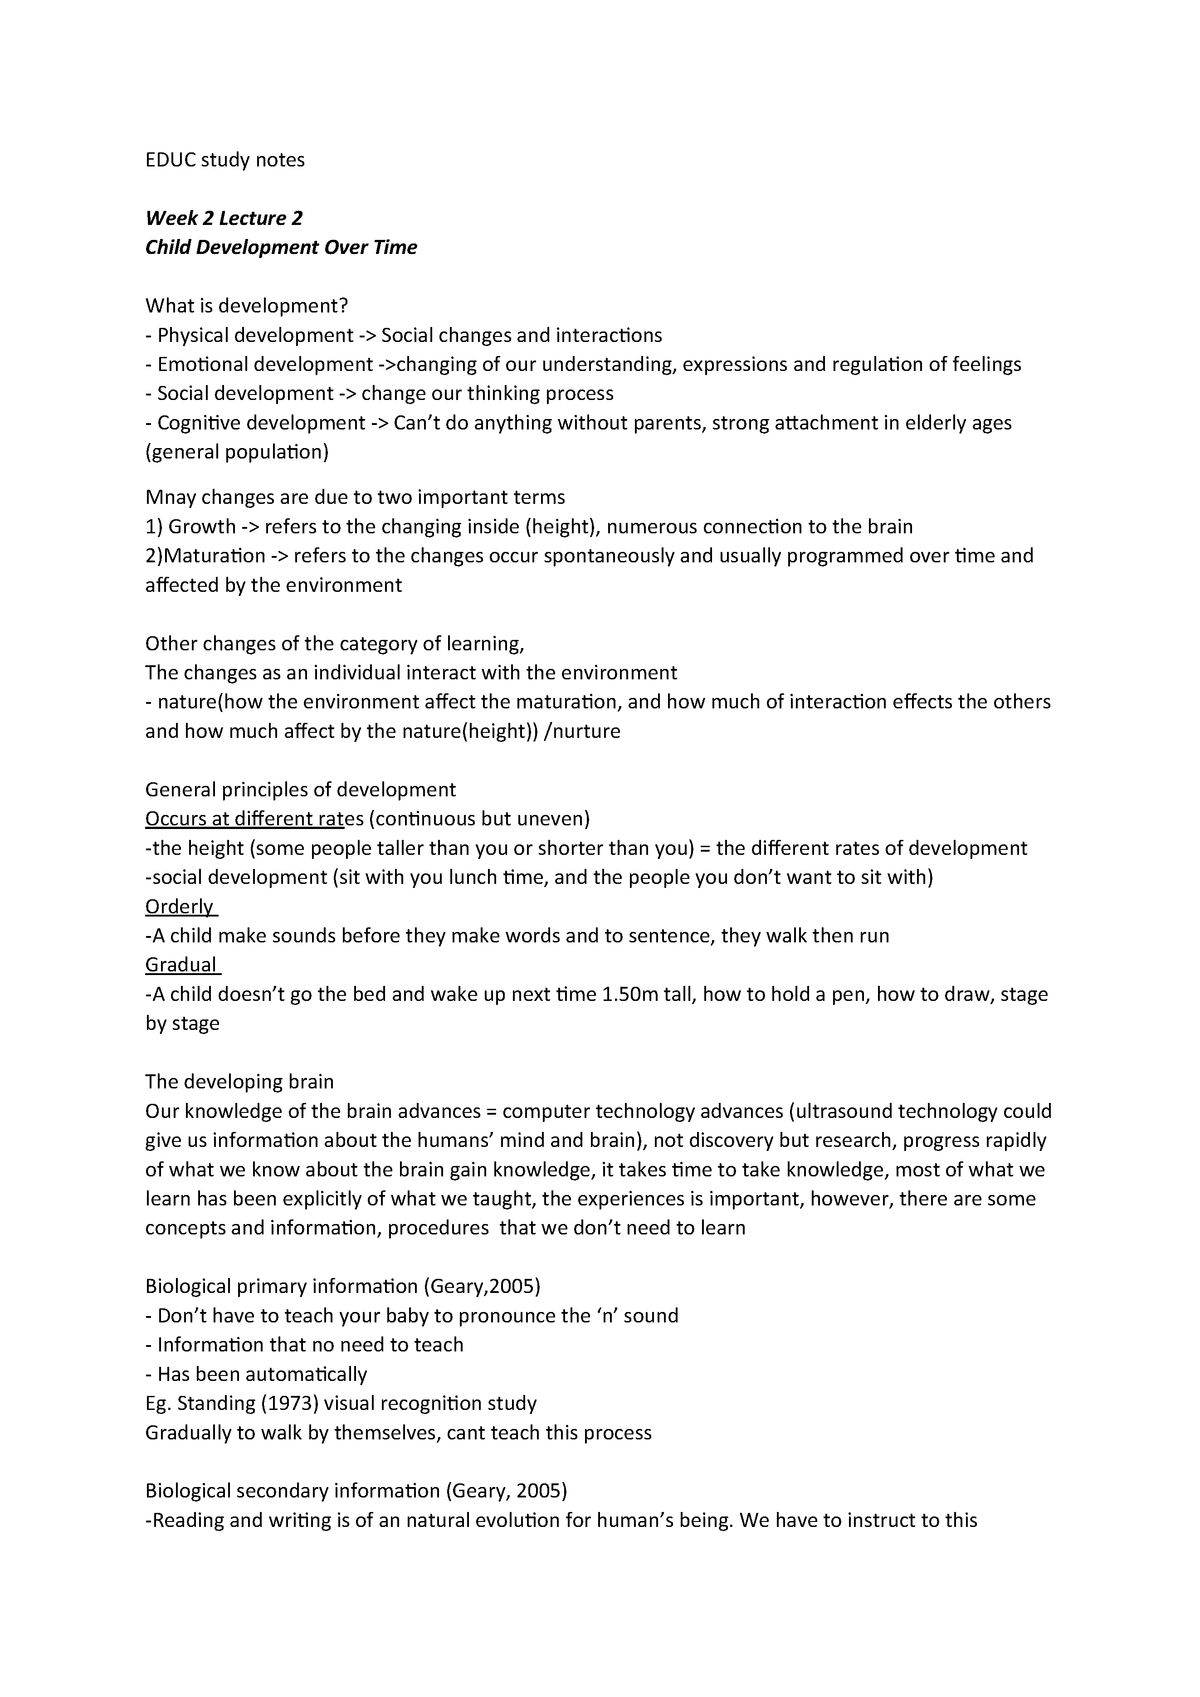 Lecture notes, lectures 1-10 - Dr  wayne - EDUC105 - MQ